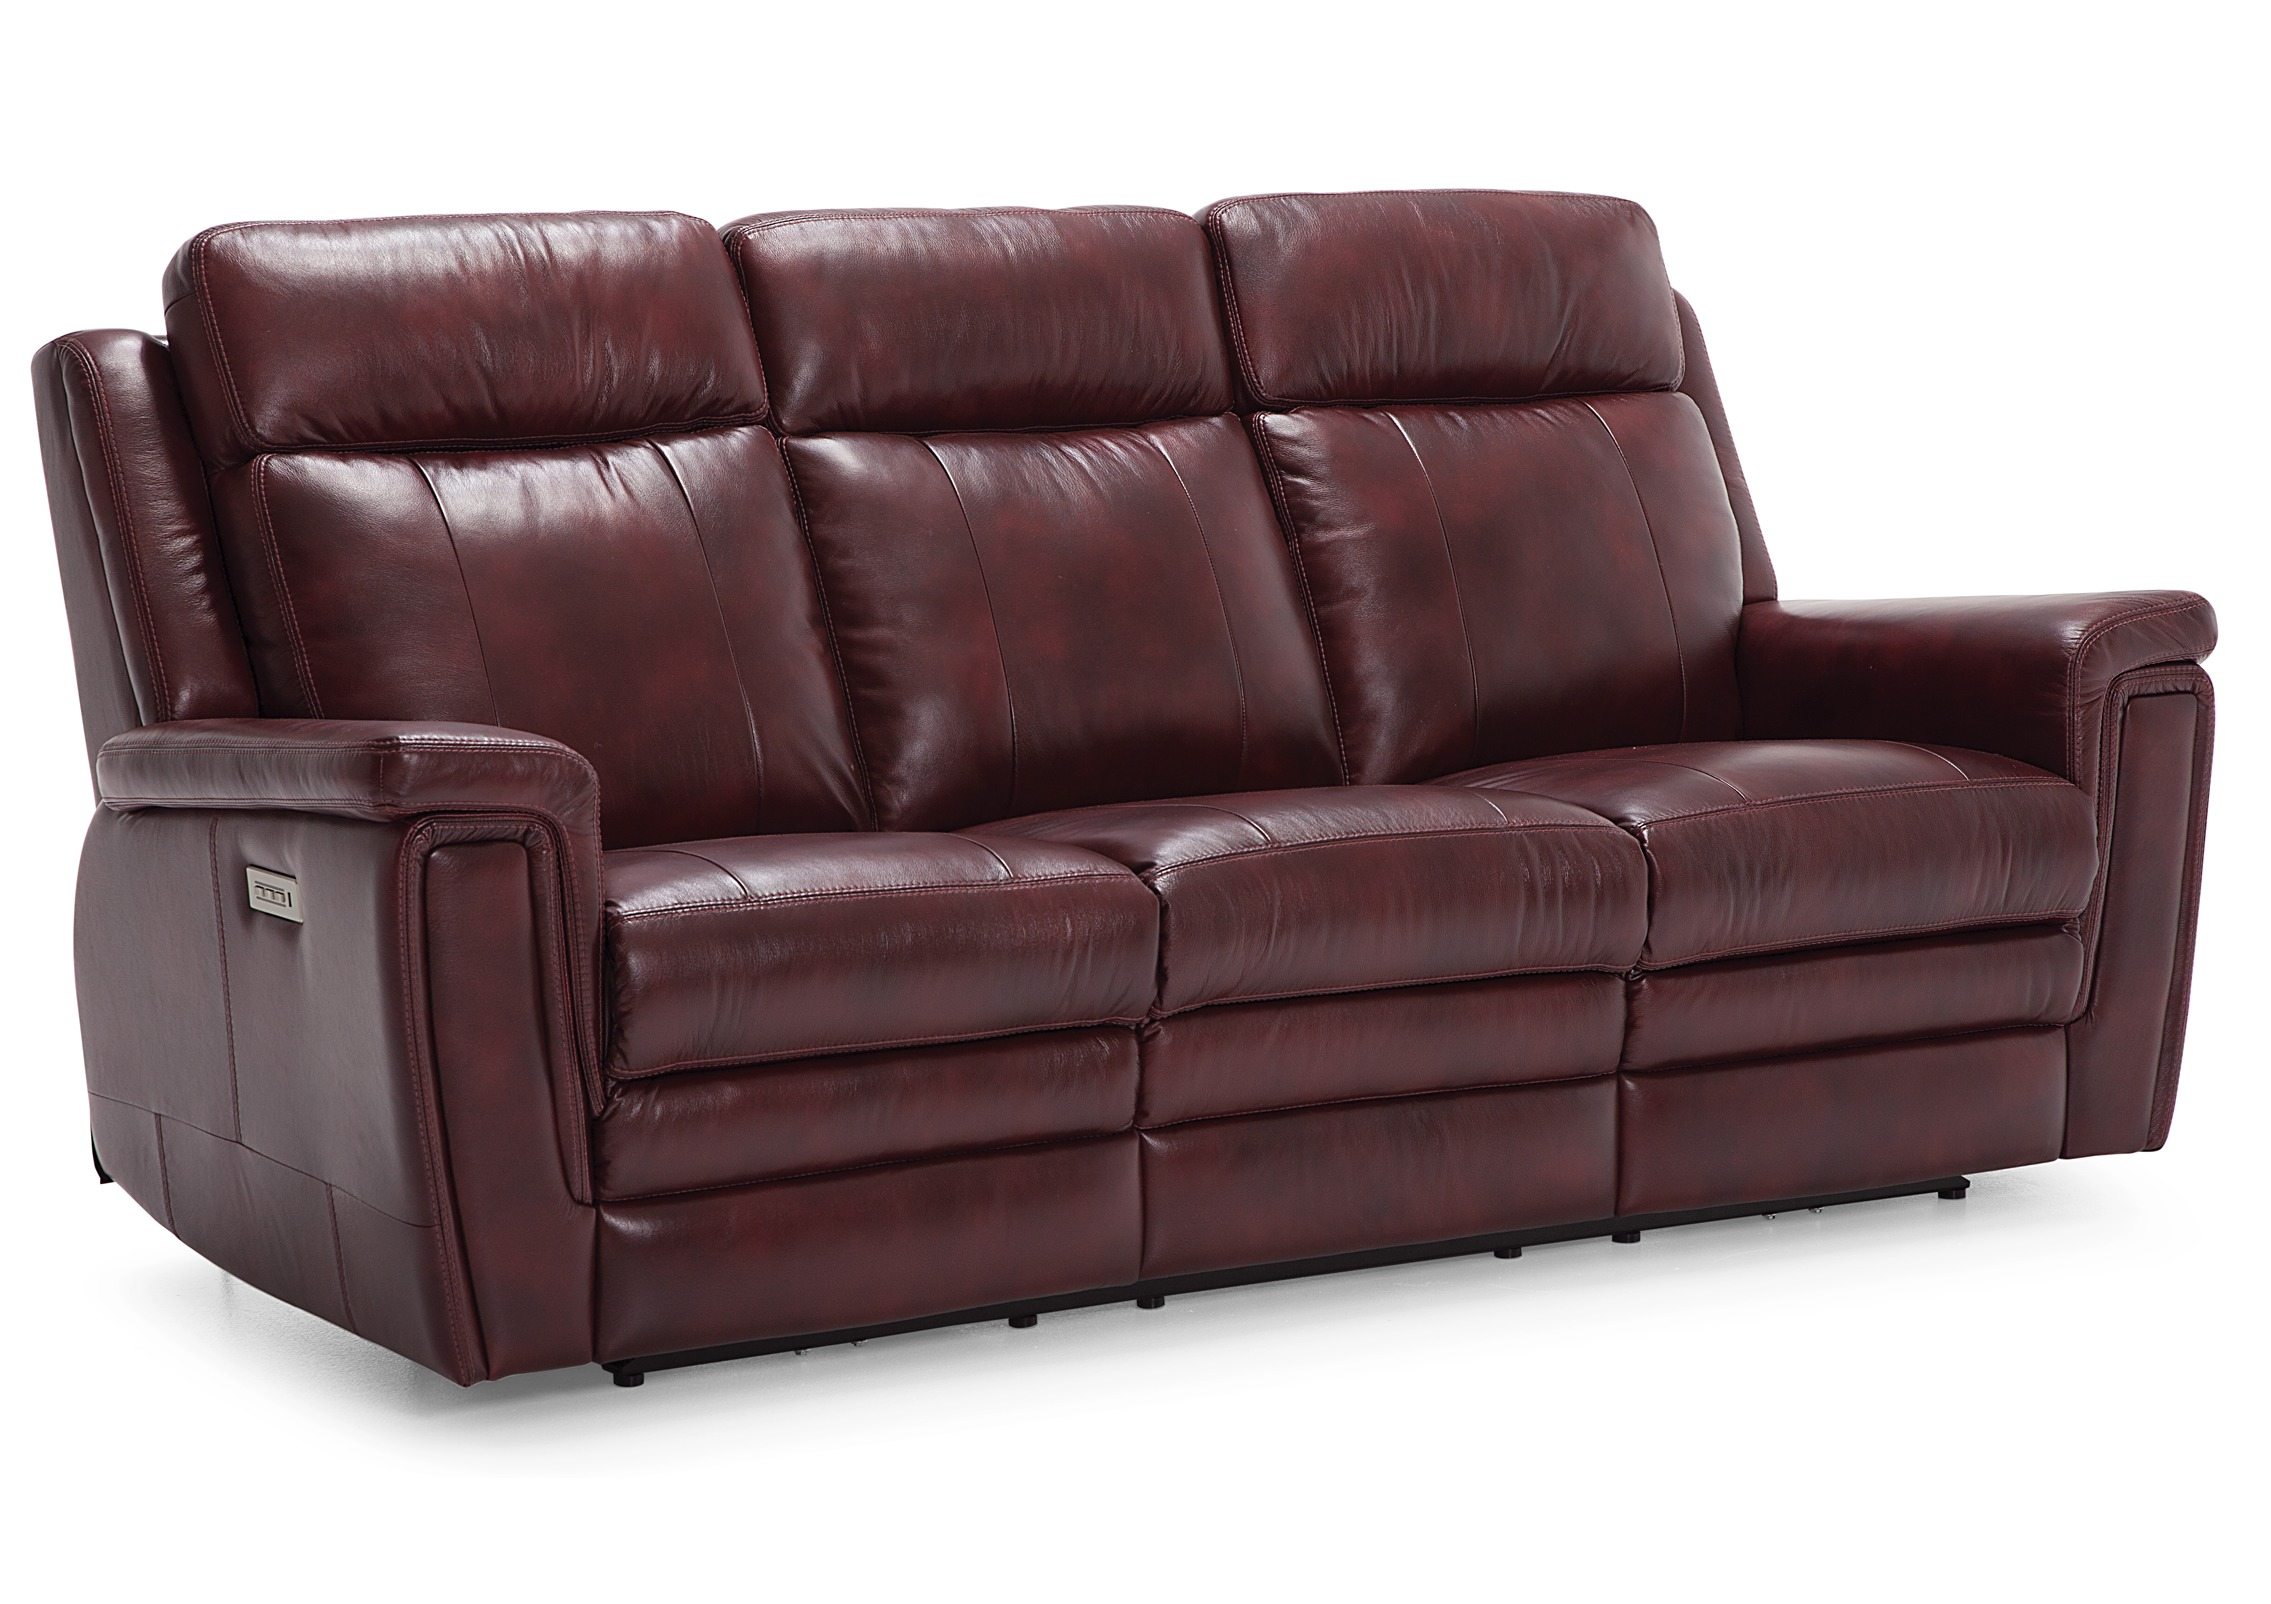 dakota sofa costco sectional with lounge sofas palliser furniture asher